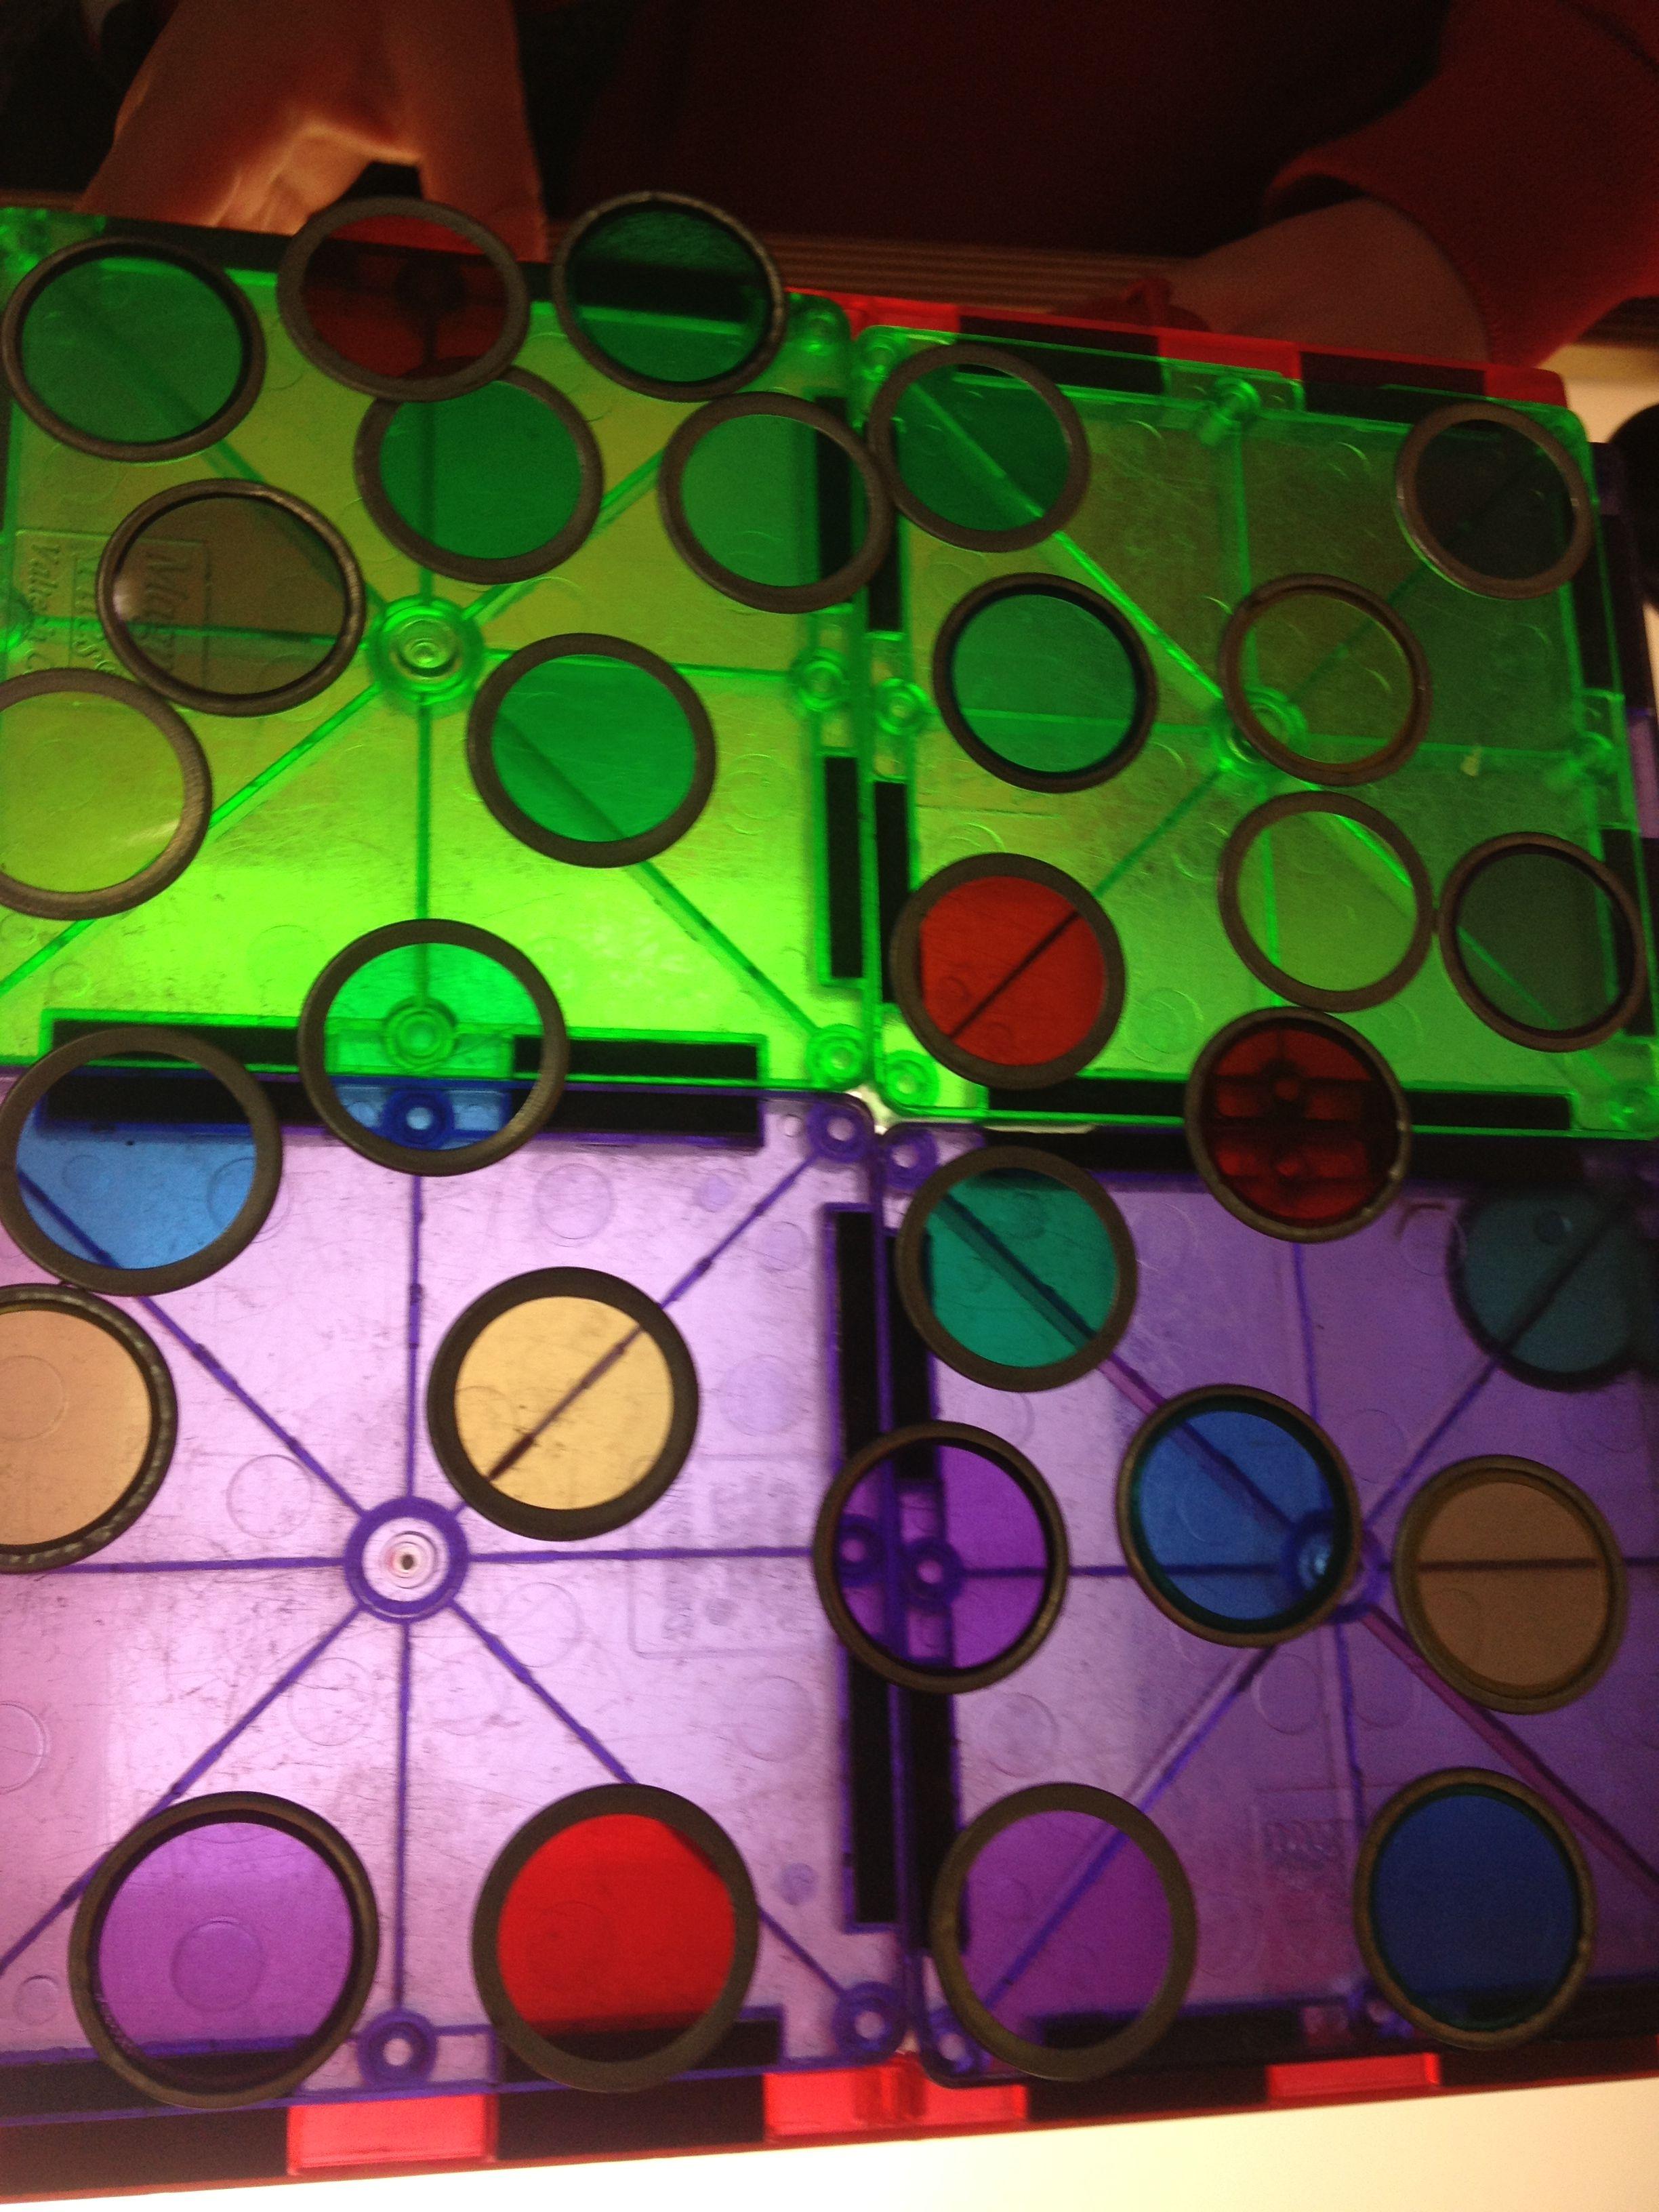 Magnetic bingo chips on magna-tiles on light table